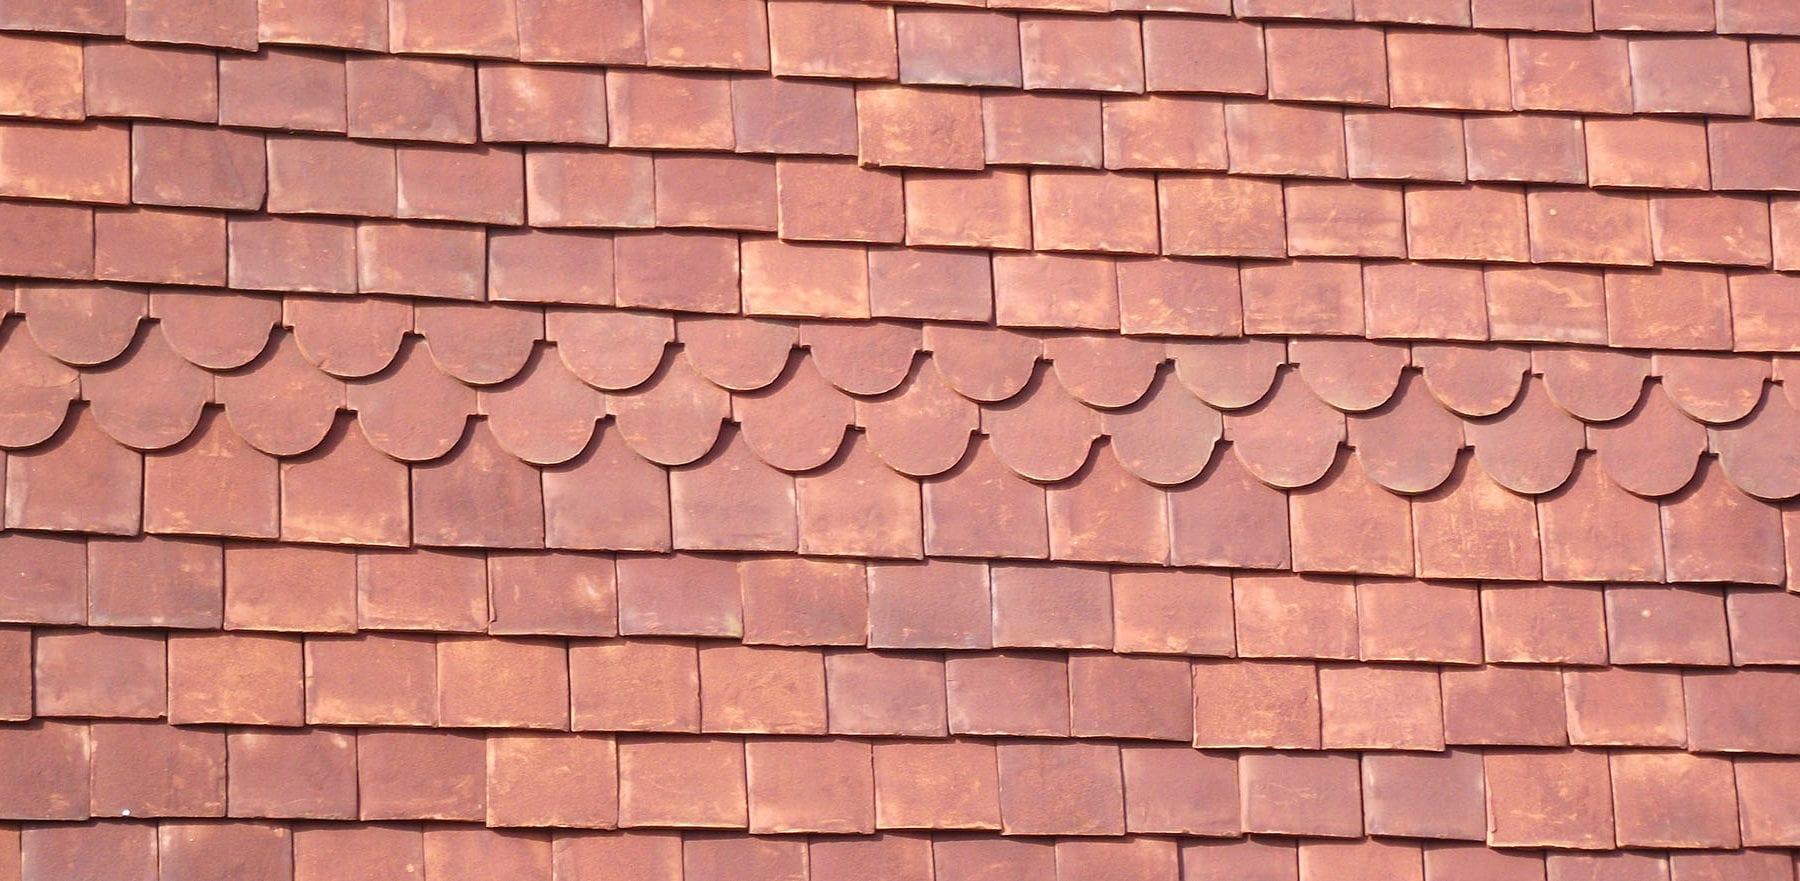 Lifestiles - Handmade Heather Clay Roof Tiles - Surrey, England 3